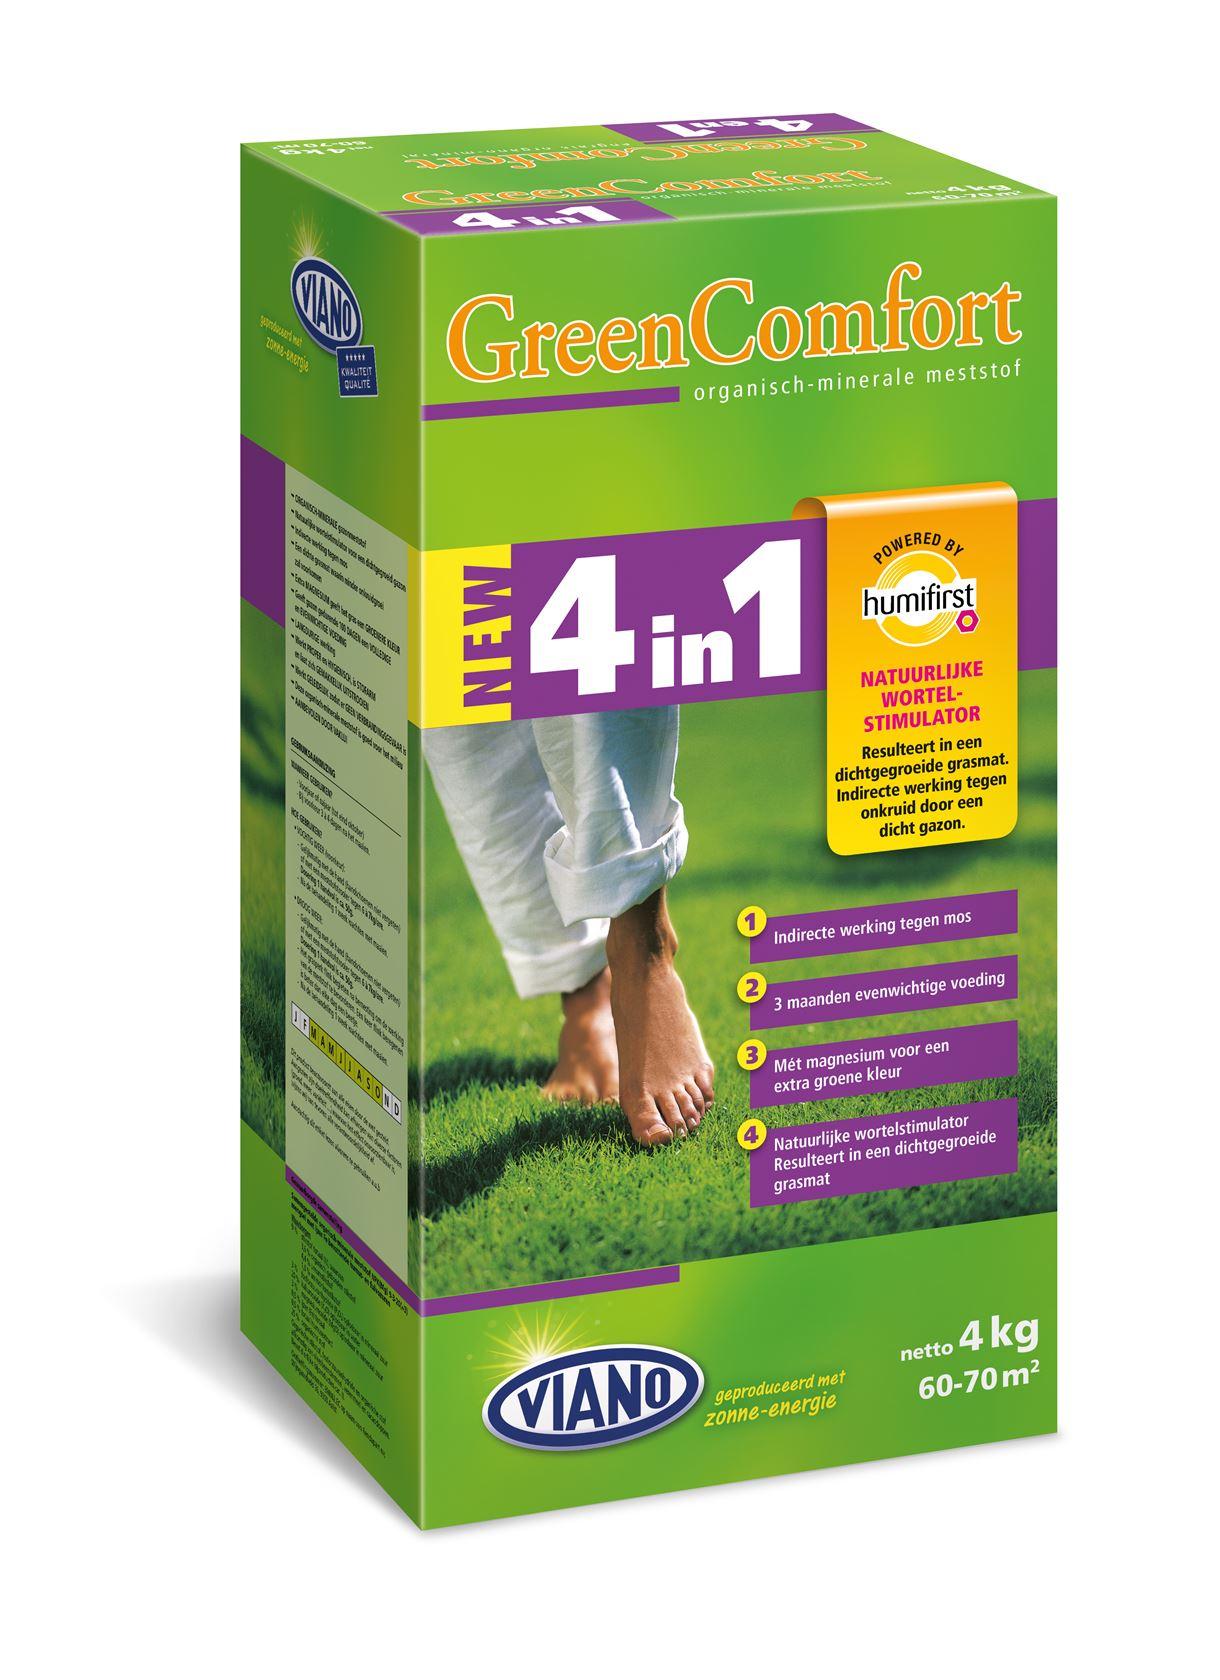 4in1-gazonmest-4kg-voor-60-80m-voorkomt-onkruid-mosdoder-diepgroene-kleur-bemesting-gazon